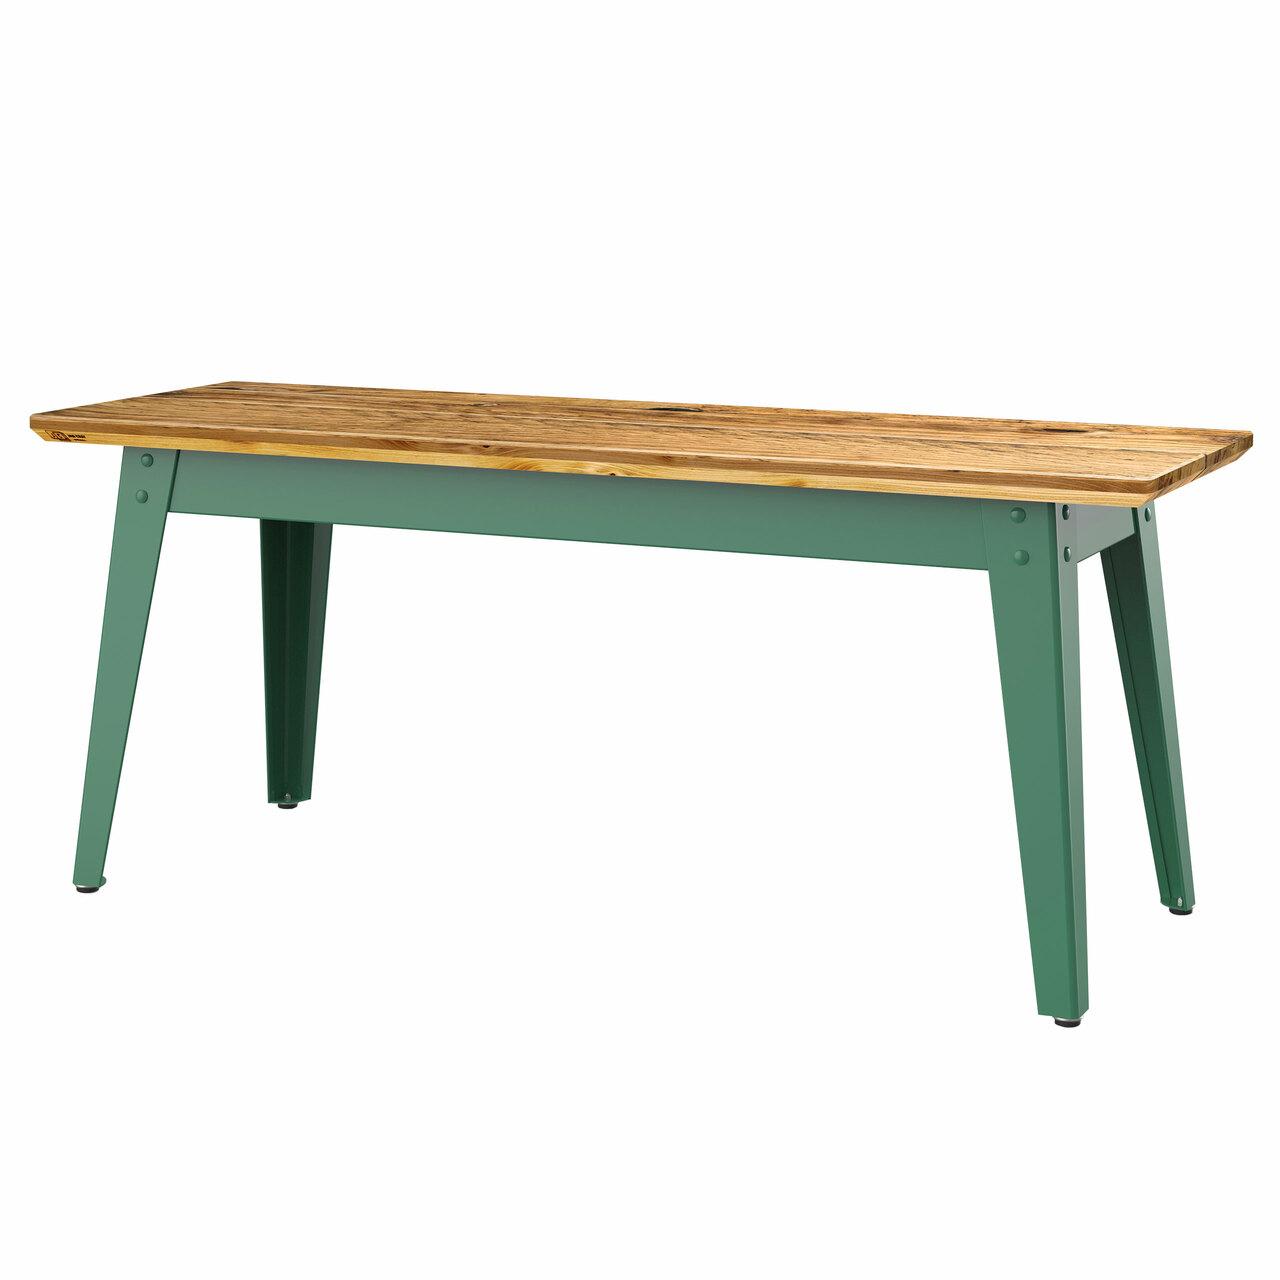 Jan Cray 6Grad Bank Bauholz B: 36 cm / L: 120 cm / H: 40 cm, Spindgrün